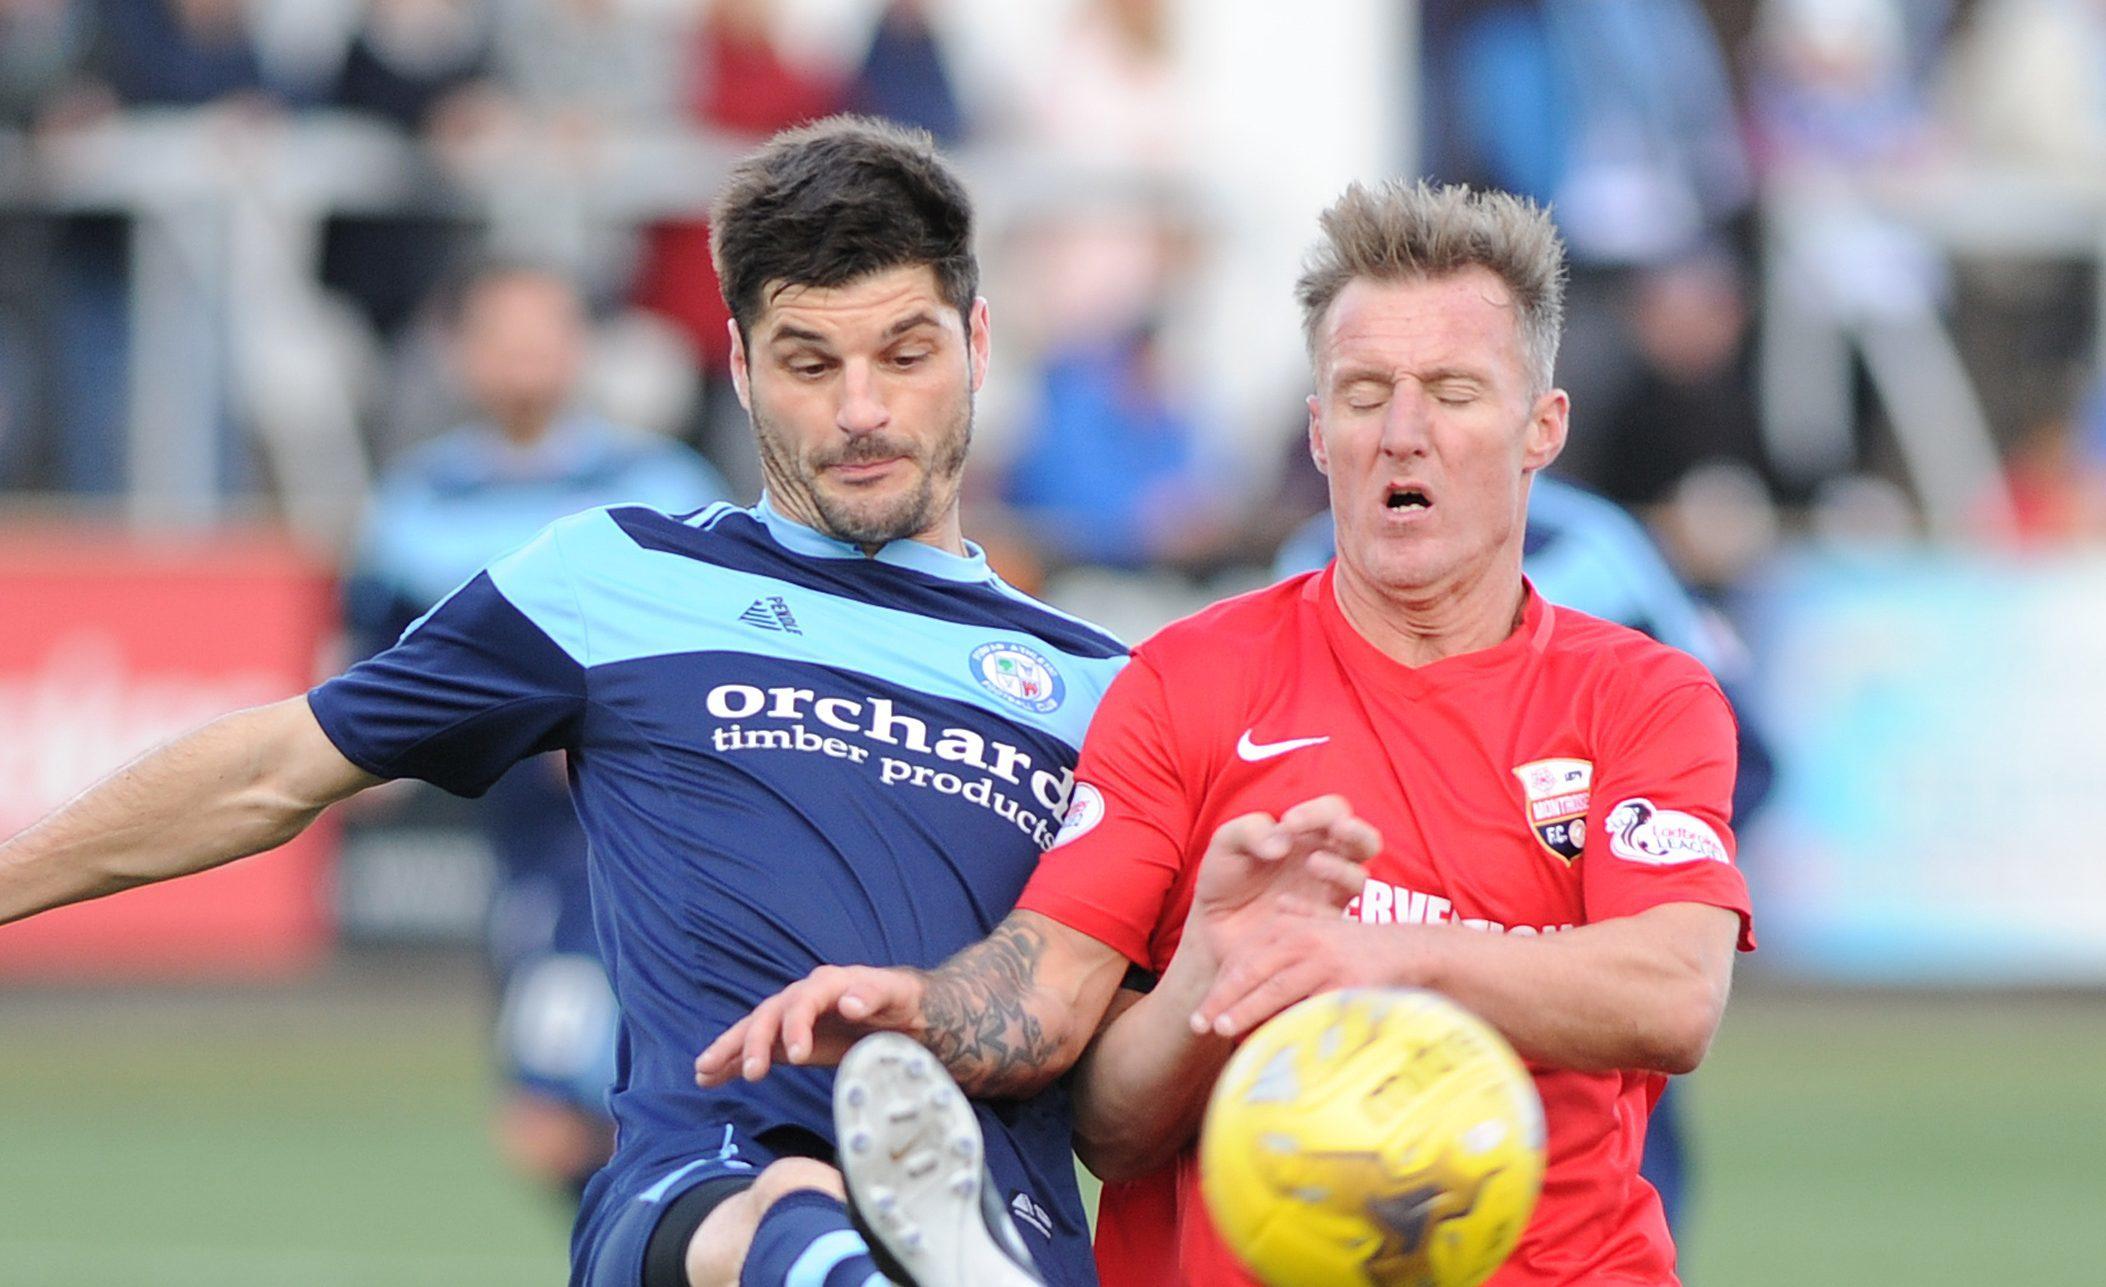 Stuart Malcolm, left, in action against Montrose last week.